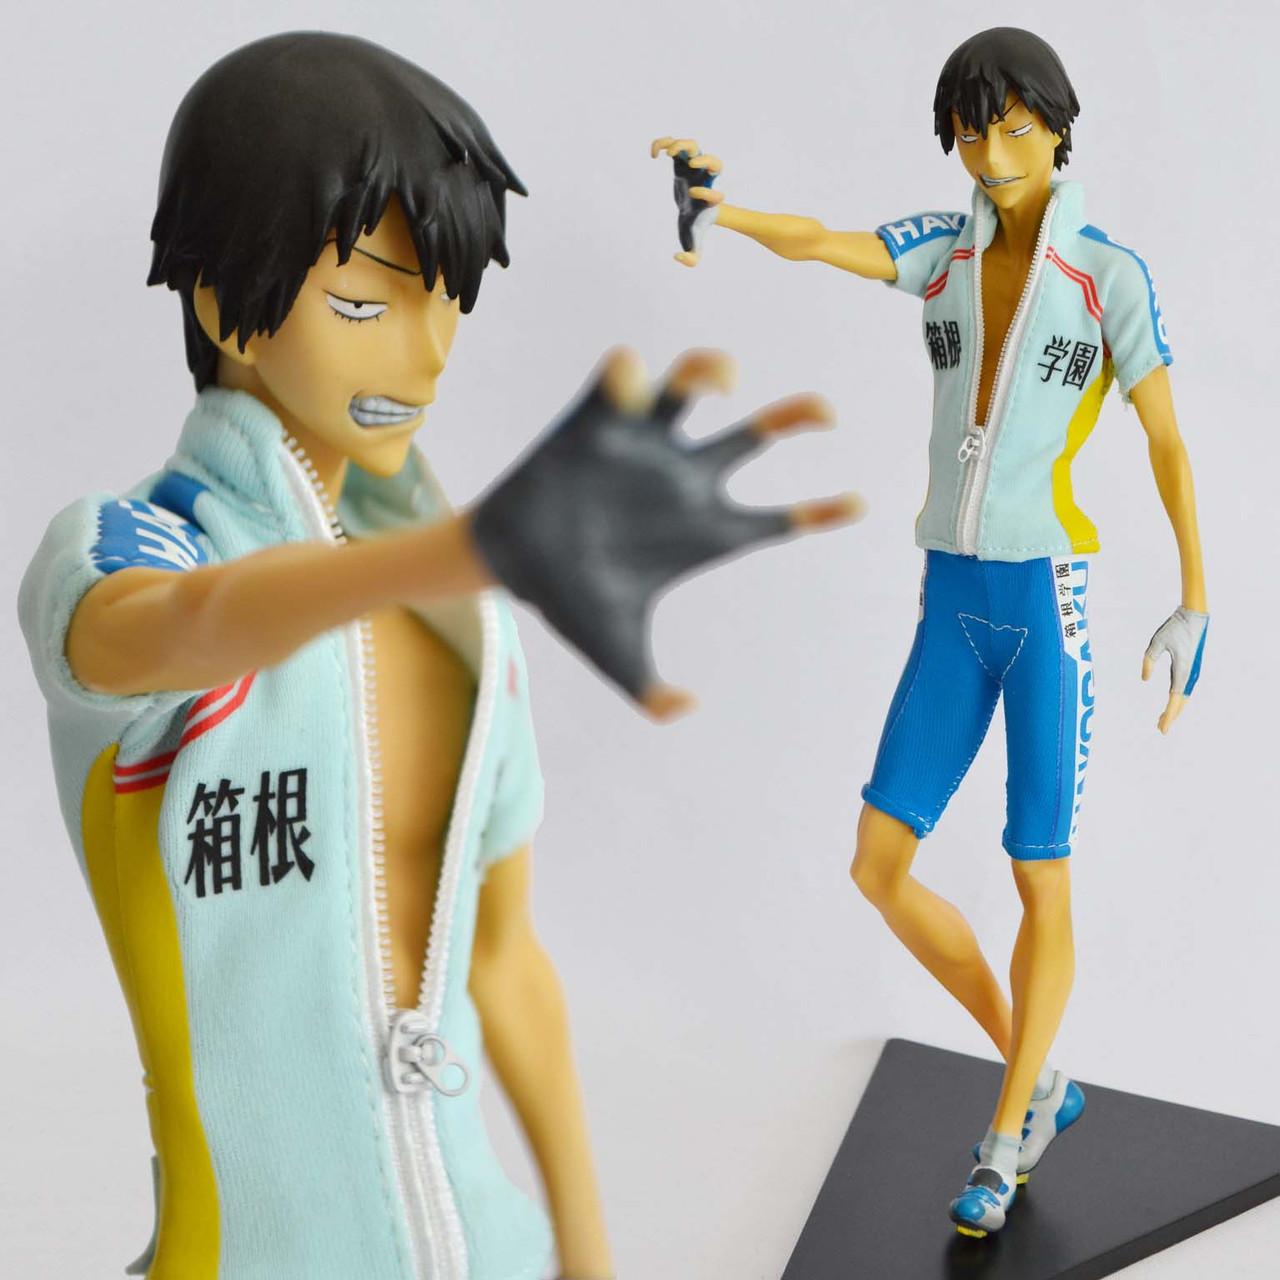 Аніме-фігурка Yasutomo Arakita from Yowamushi Pedal